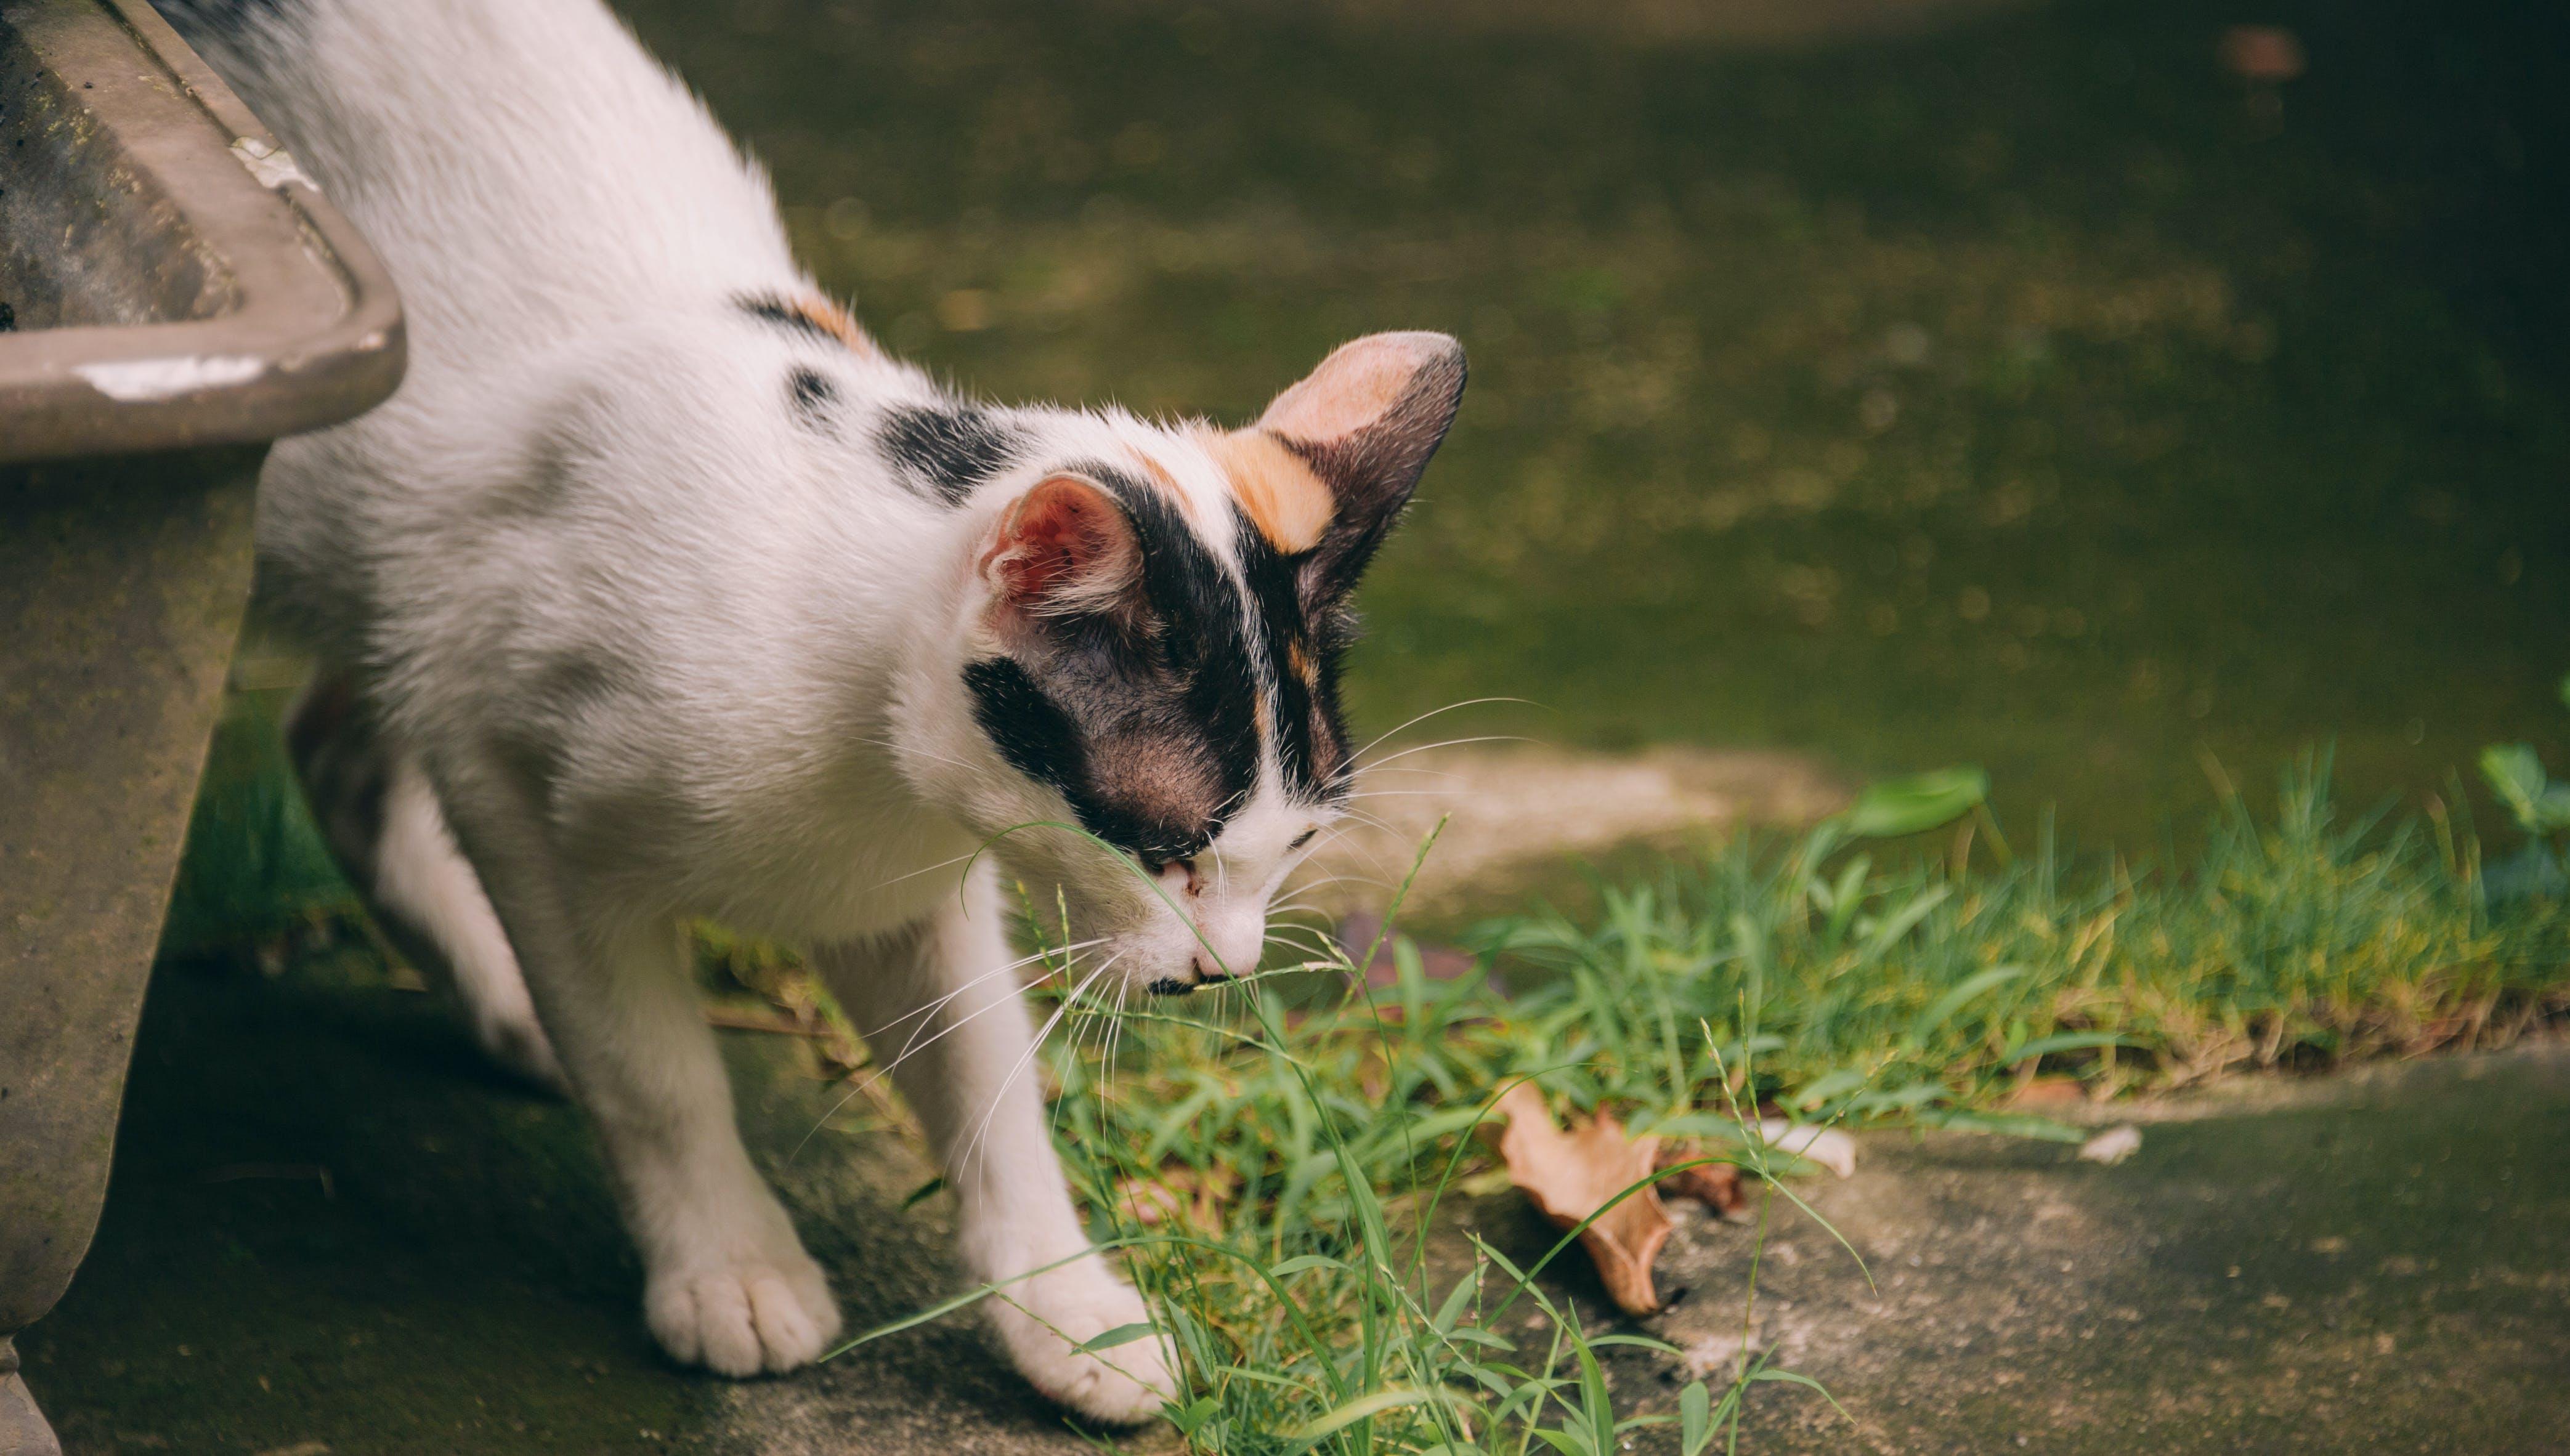 Short-fur White and Black Cat Near Pond